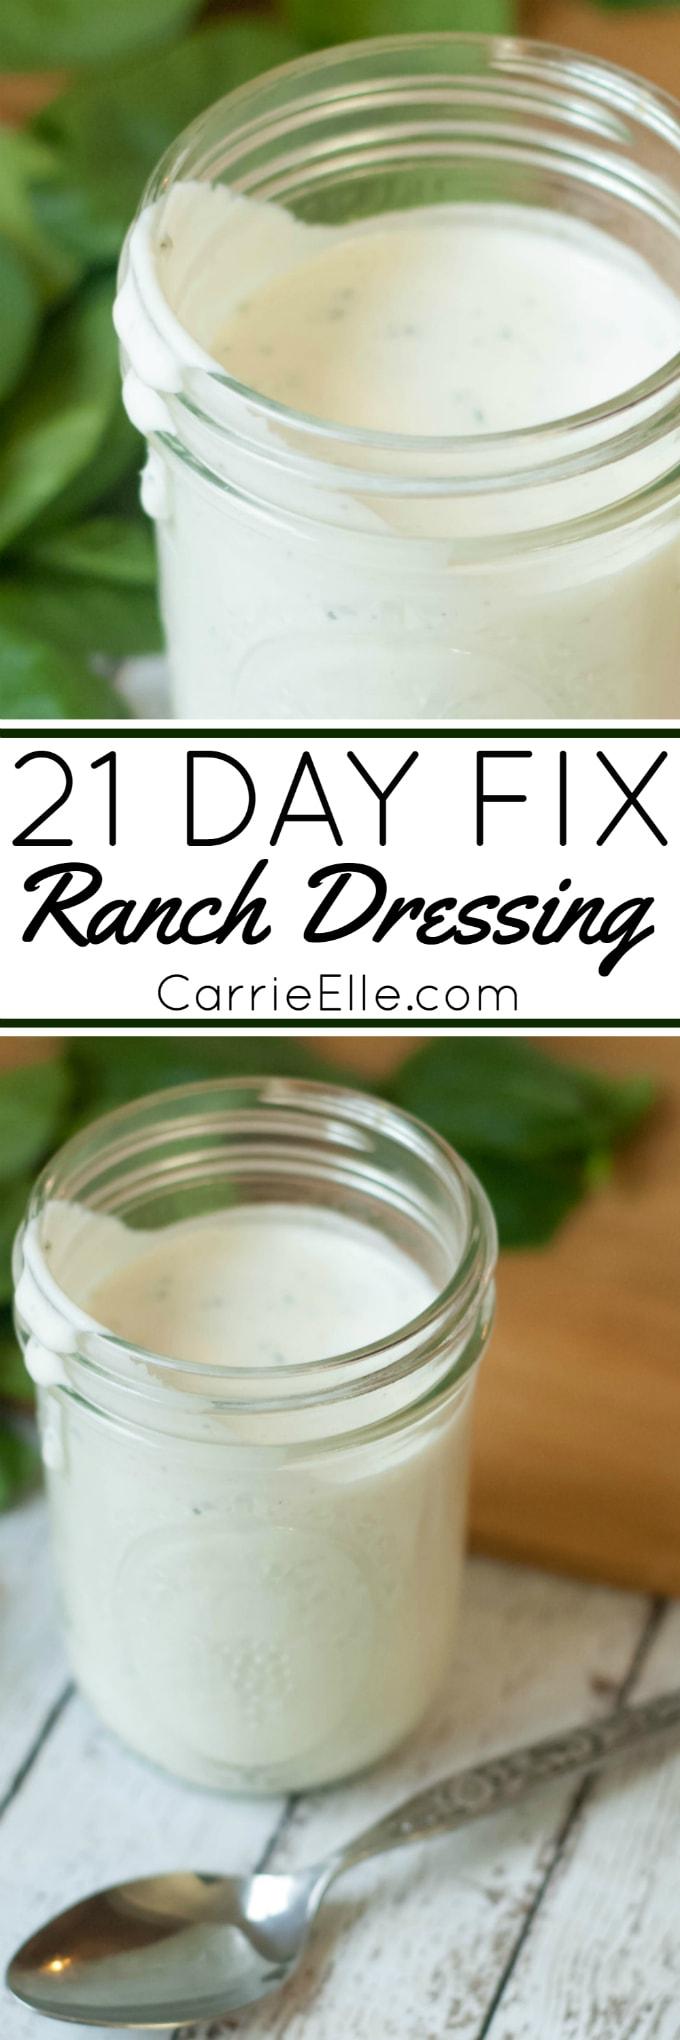 21 Day Fix Ranch Dressing Recipe